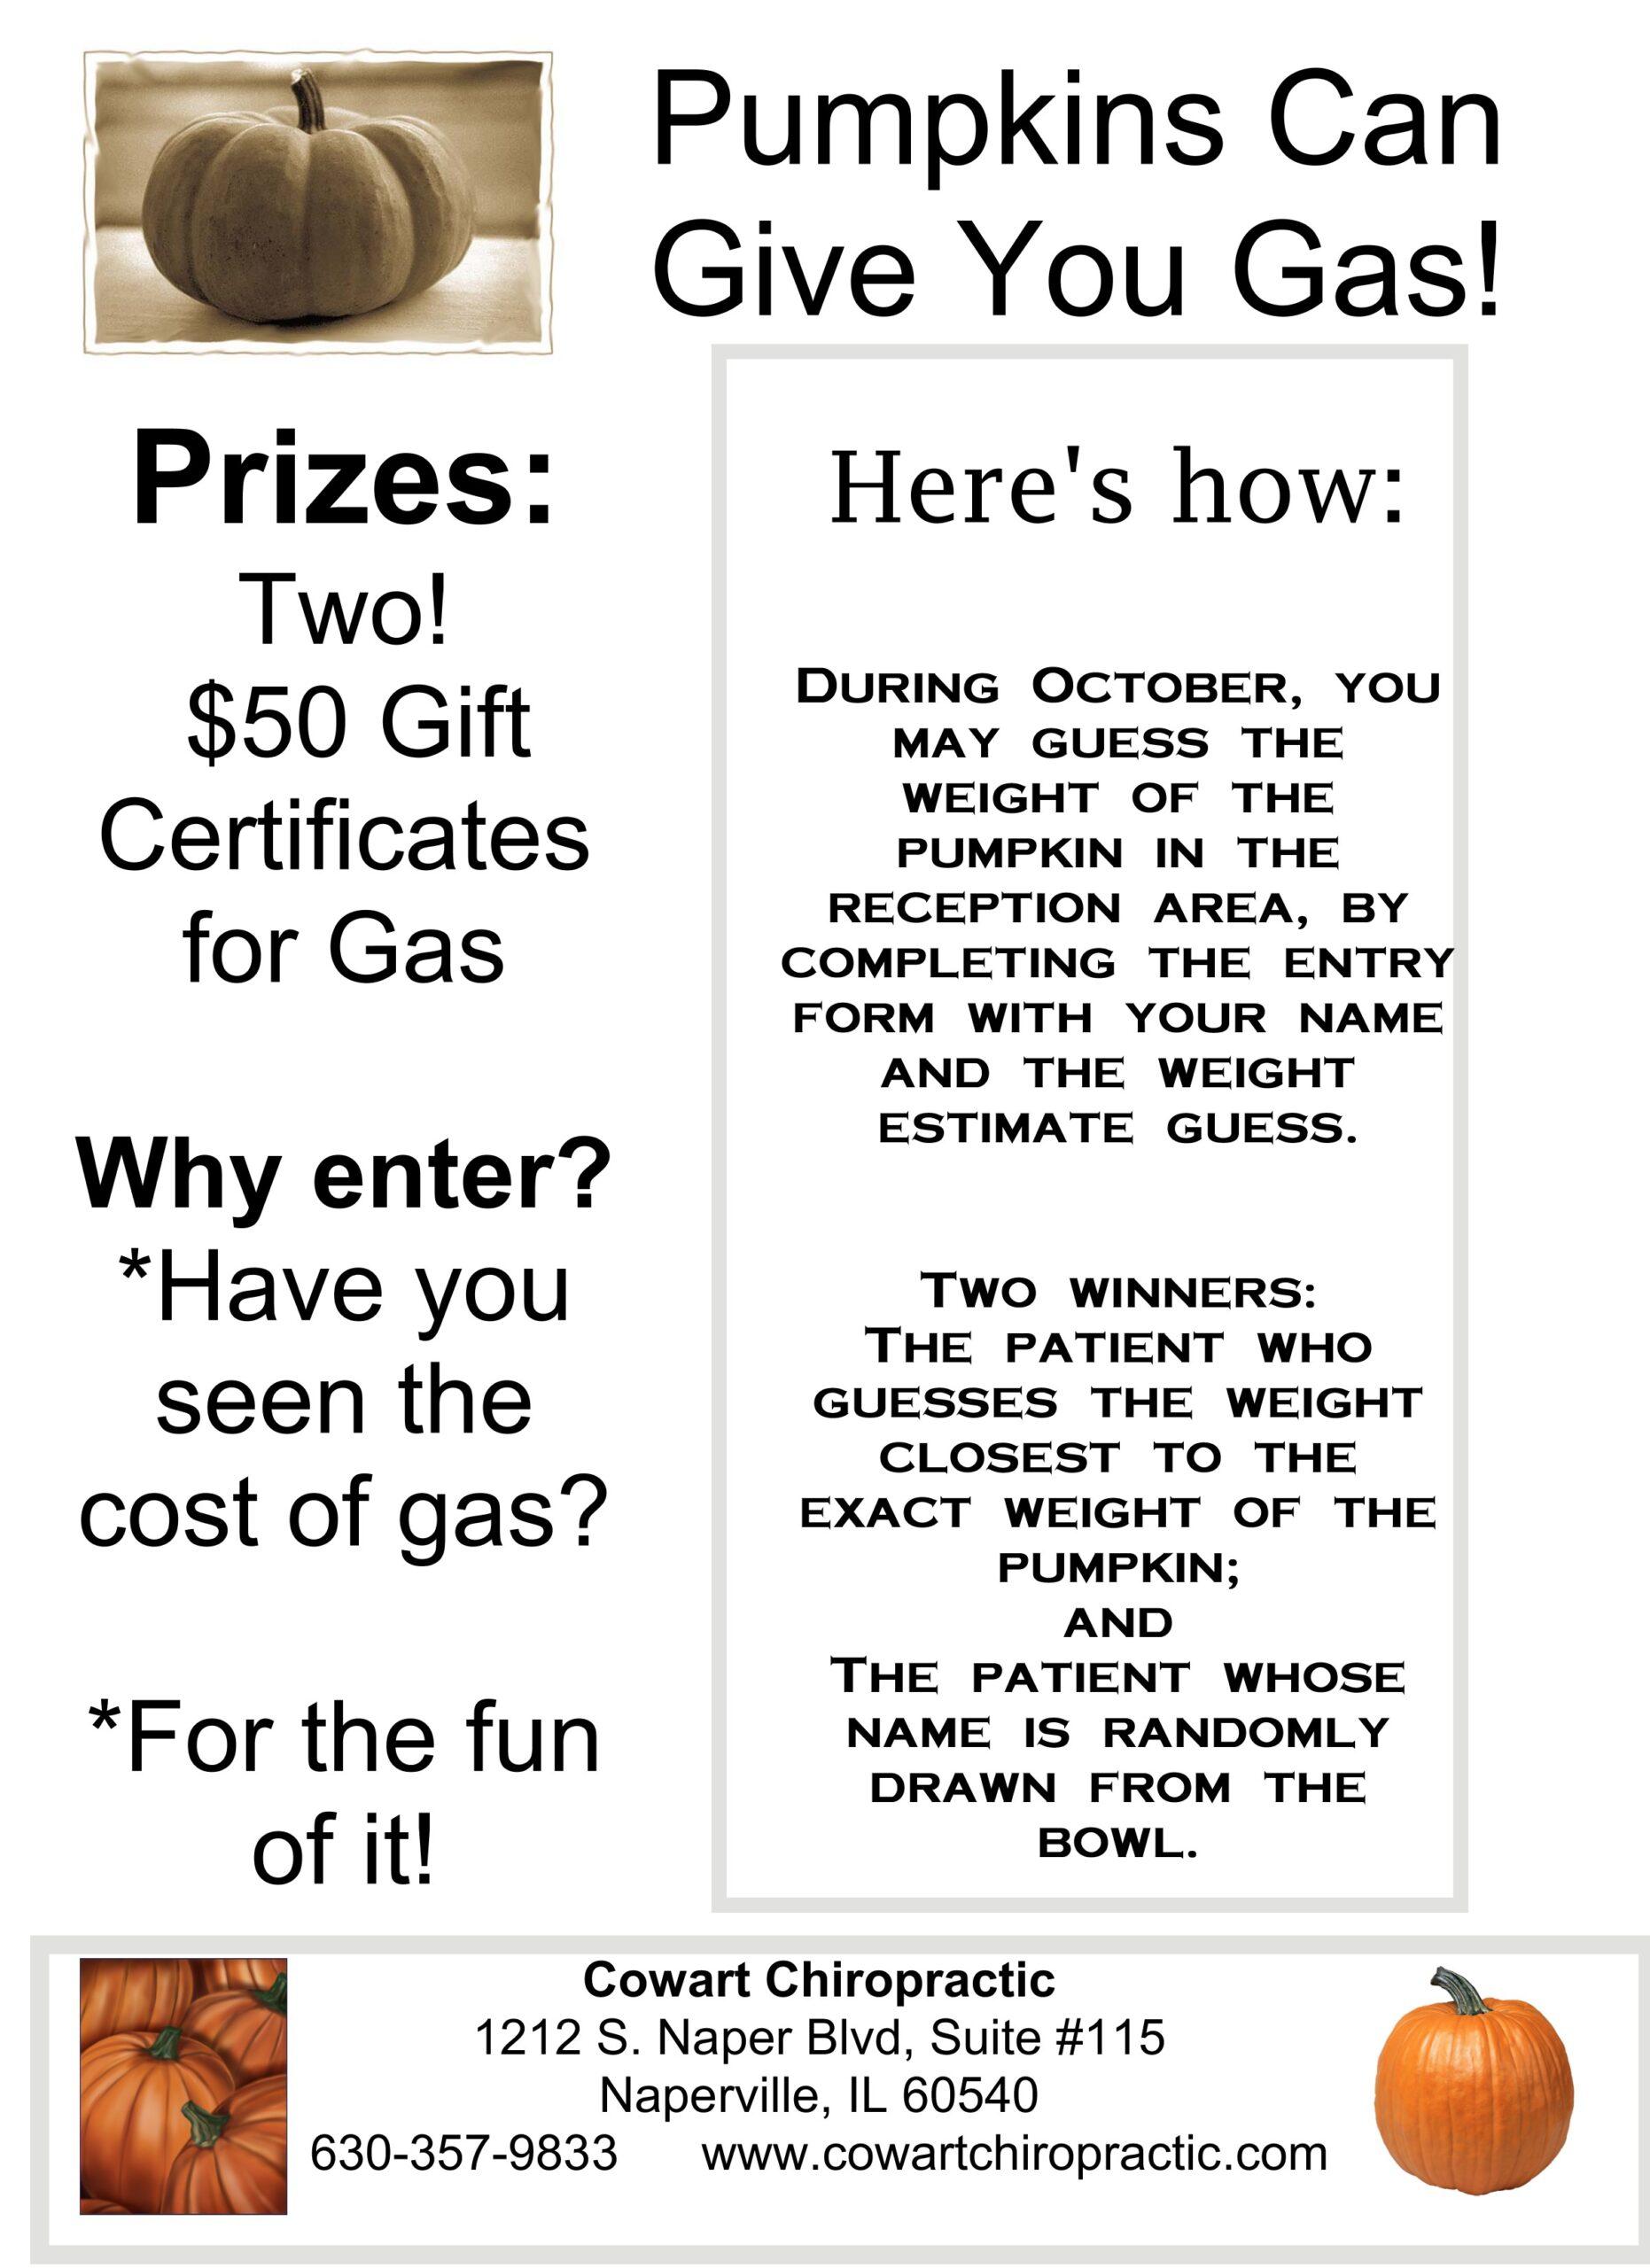 Pumpkins give you gas 2_2_2_2-001